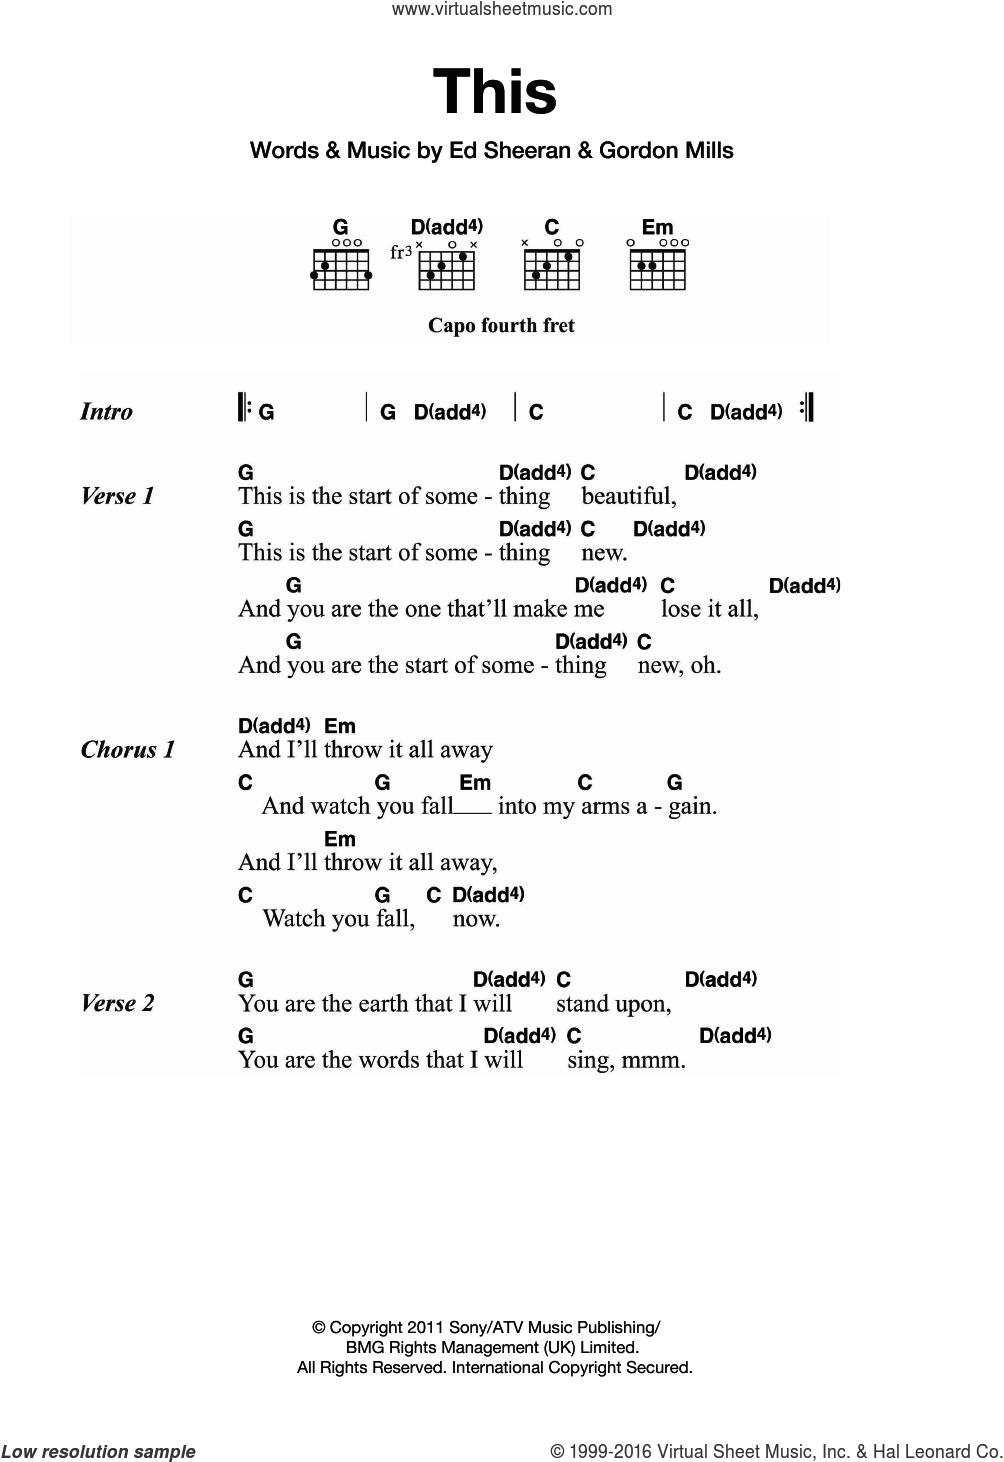 Ed Sheeran Chords Sheeran This Sheet Music For Guitar Chords Pdf